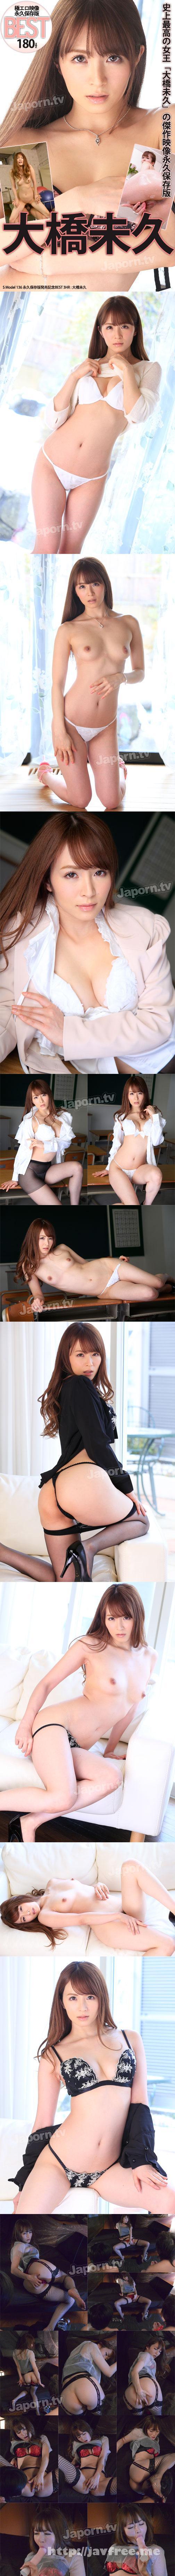 [SMD 136] S Model 136  永久保存版発売記念BEST 3HR : 大橋未久 大橋未久 SMD Miku Ohashi